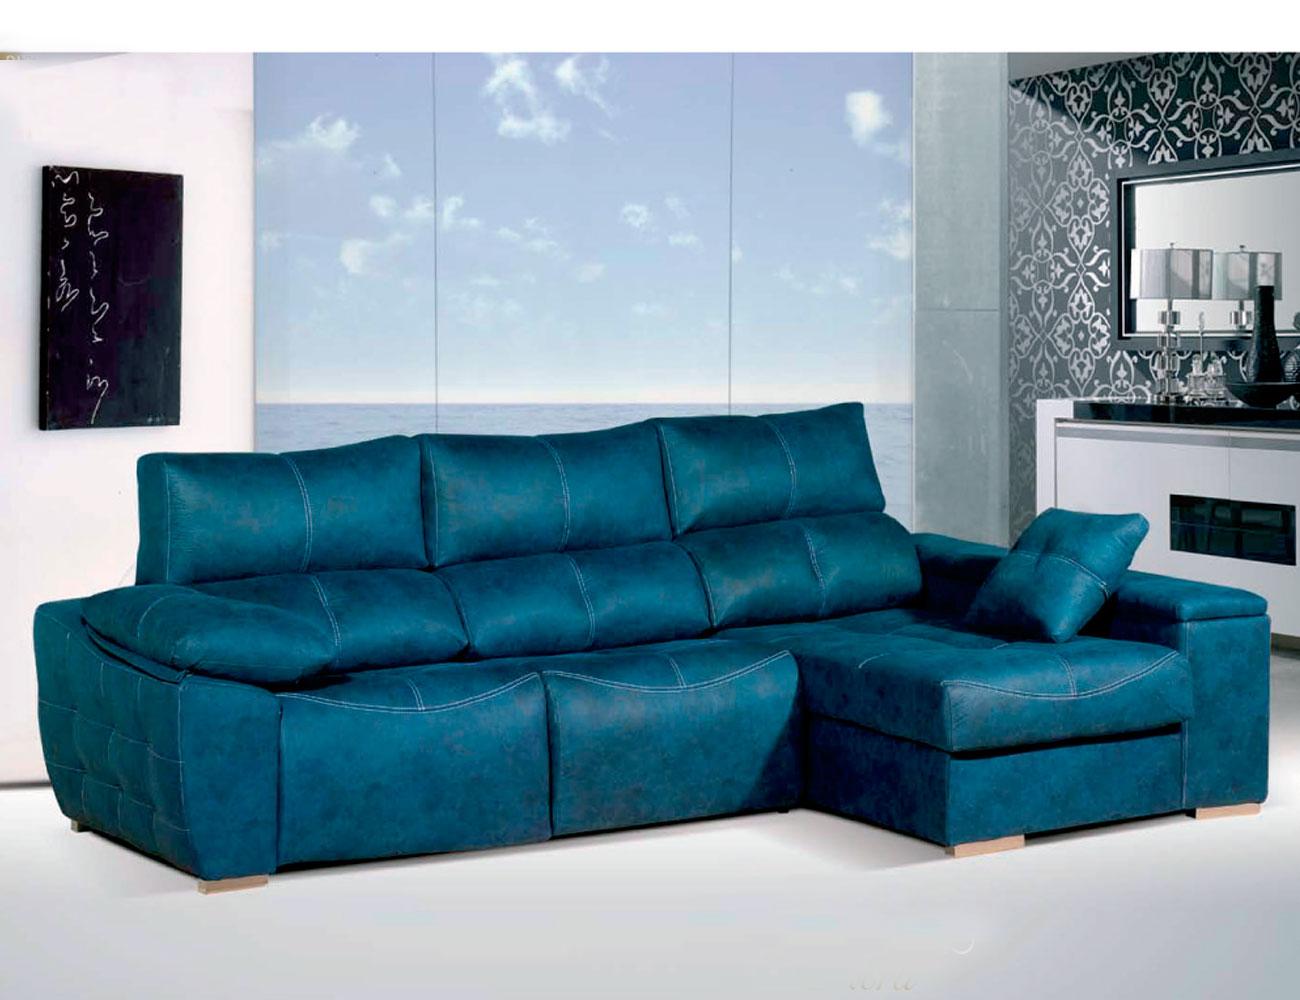 Sofa chaiselongue relax 2 motores anti manchas turquesa14